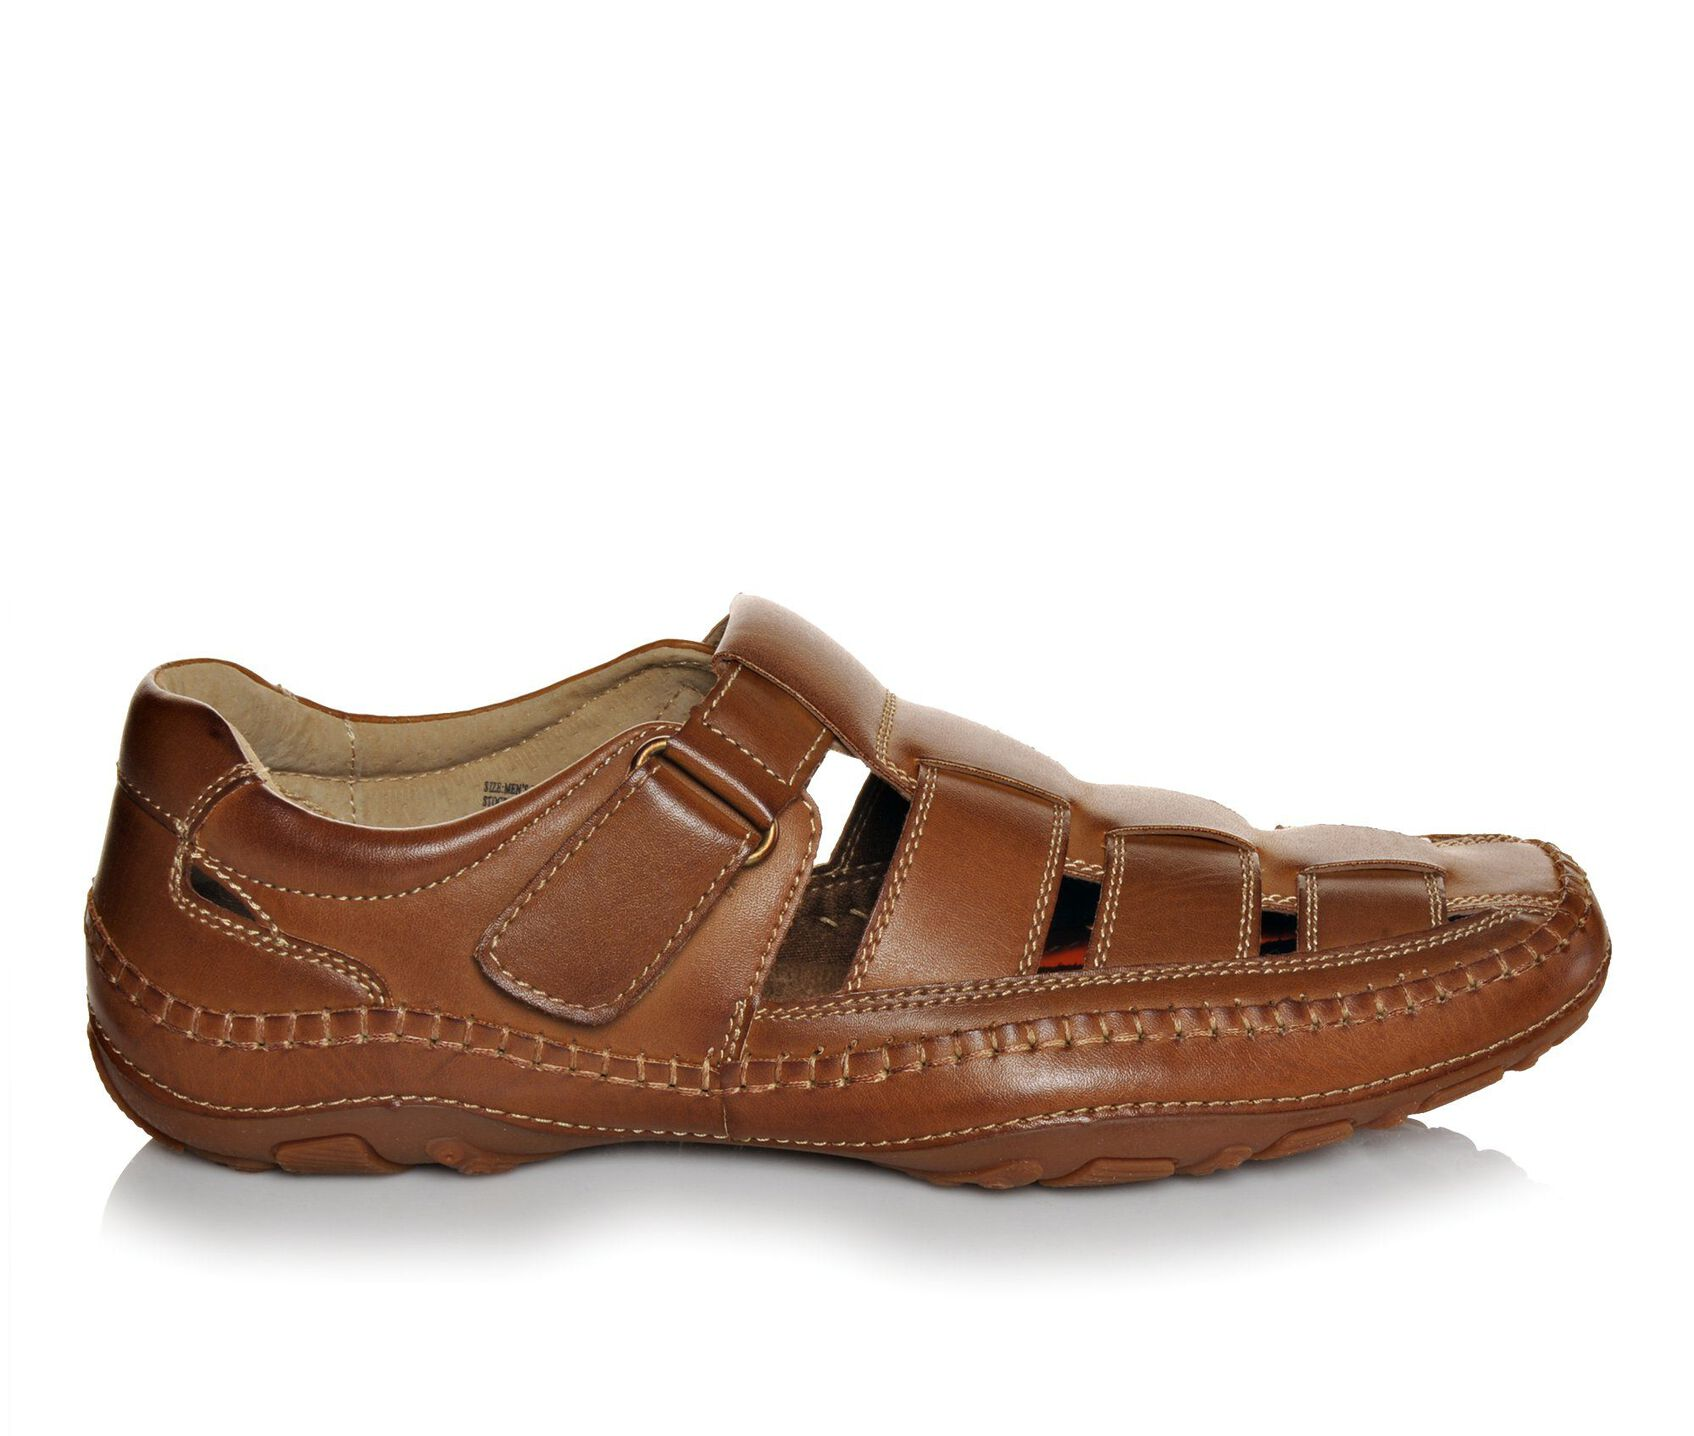 c8369783ecf Men s GBX Sentaur Sandals